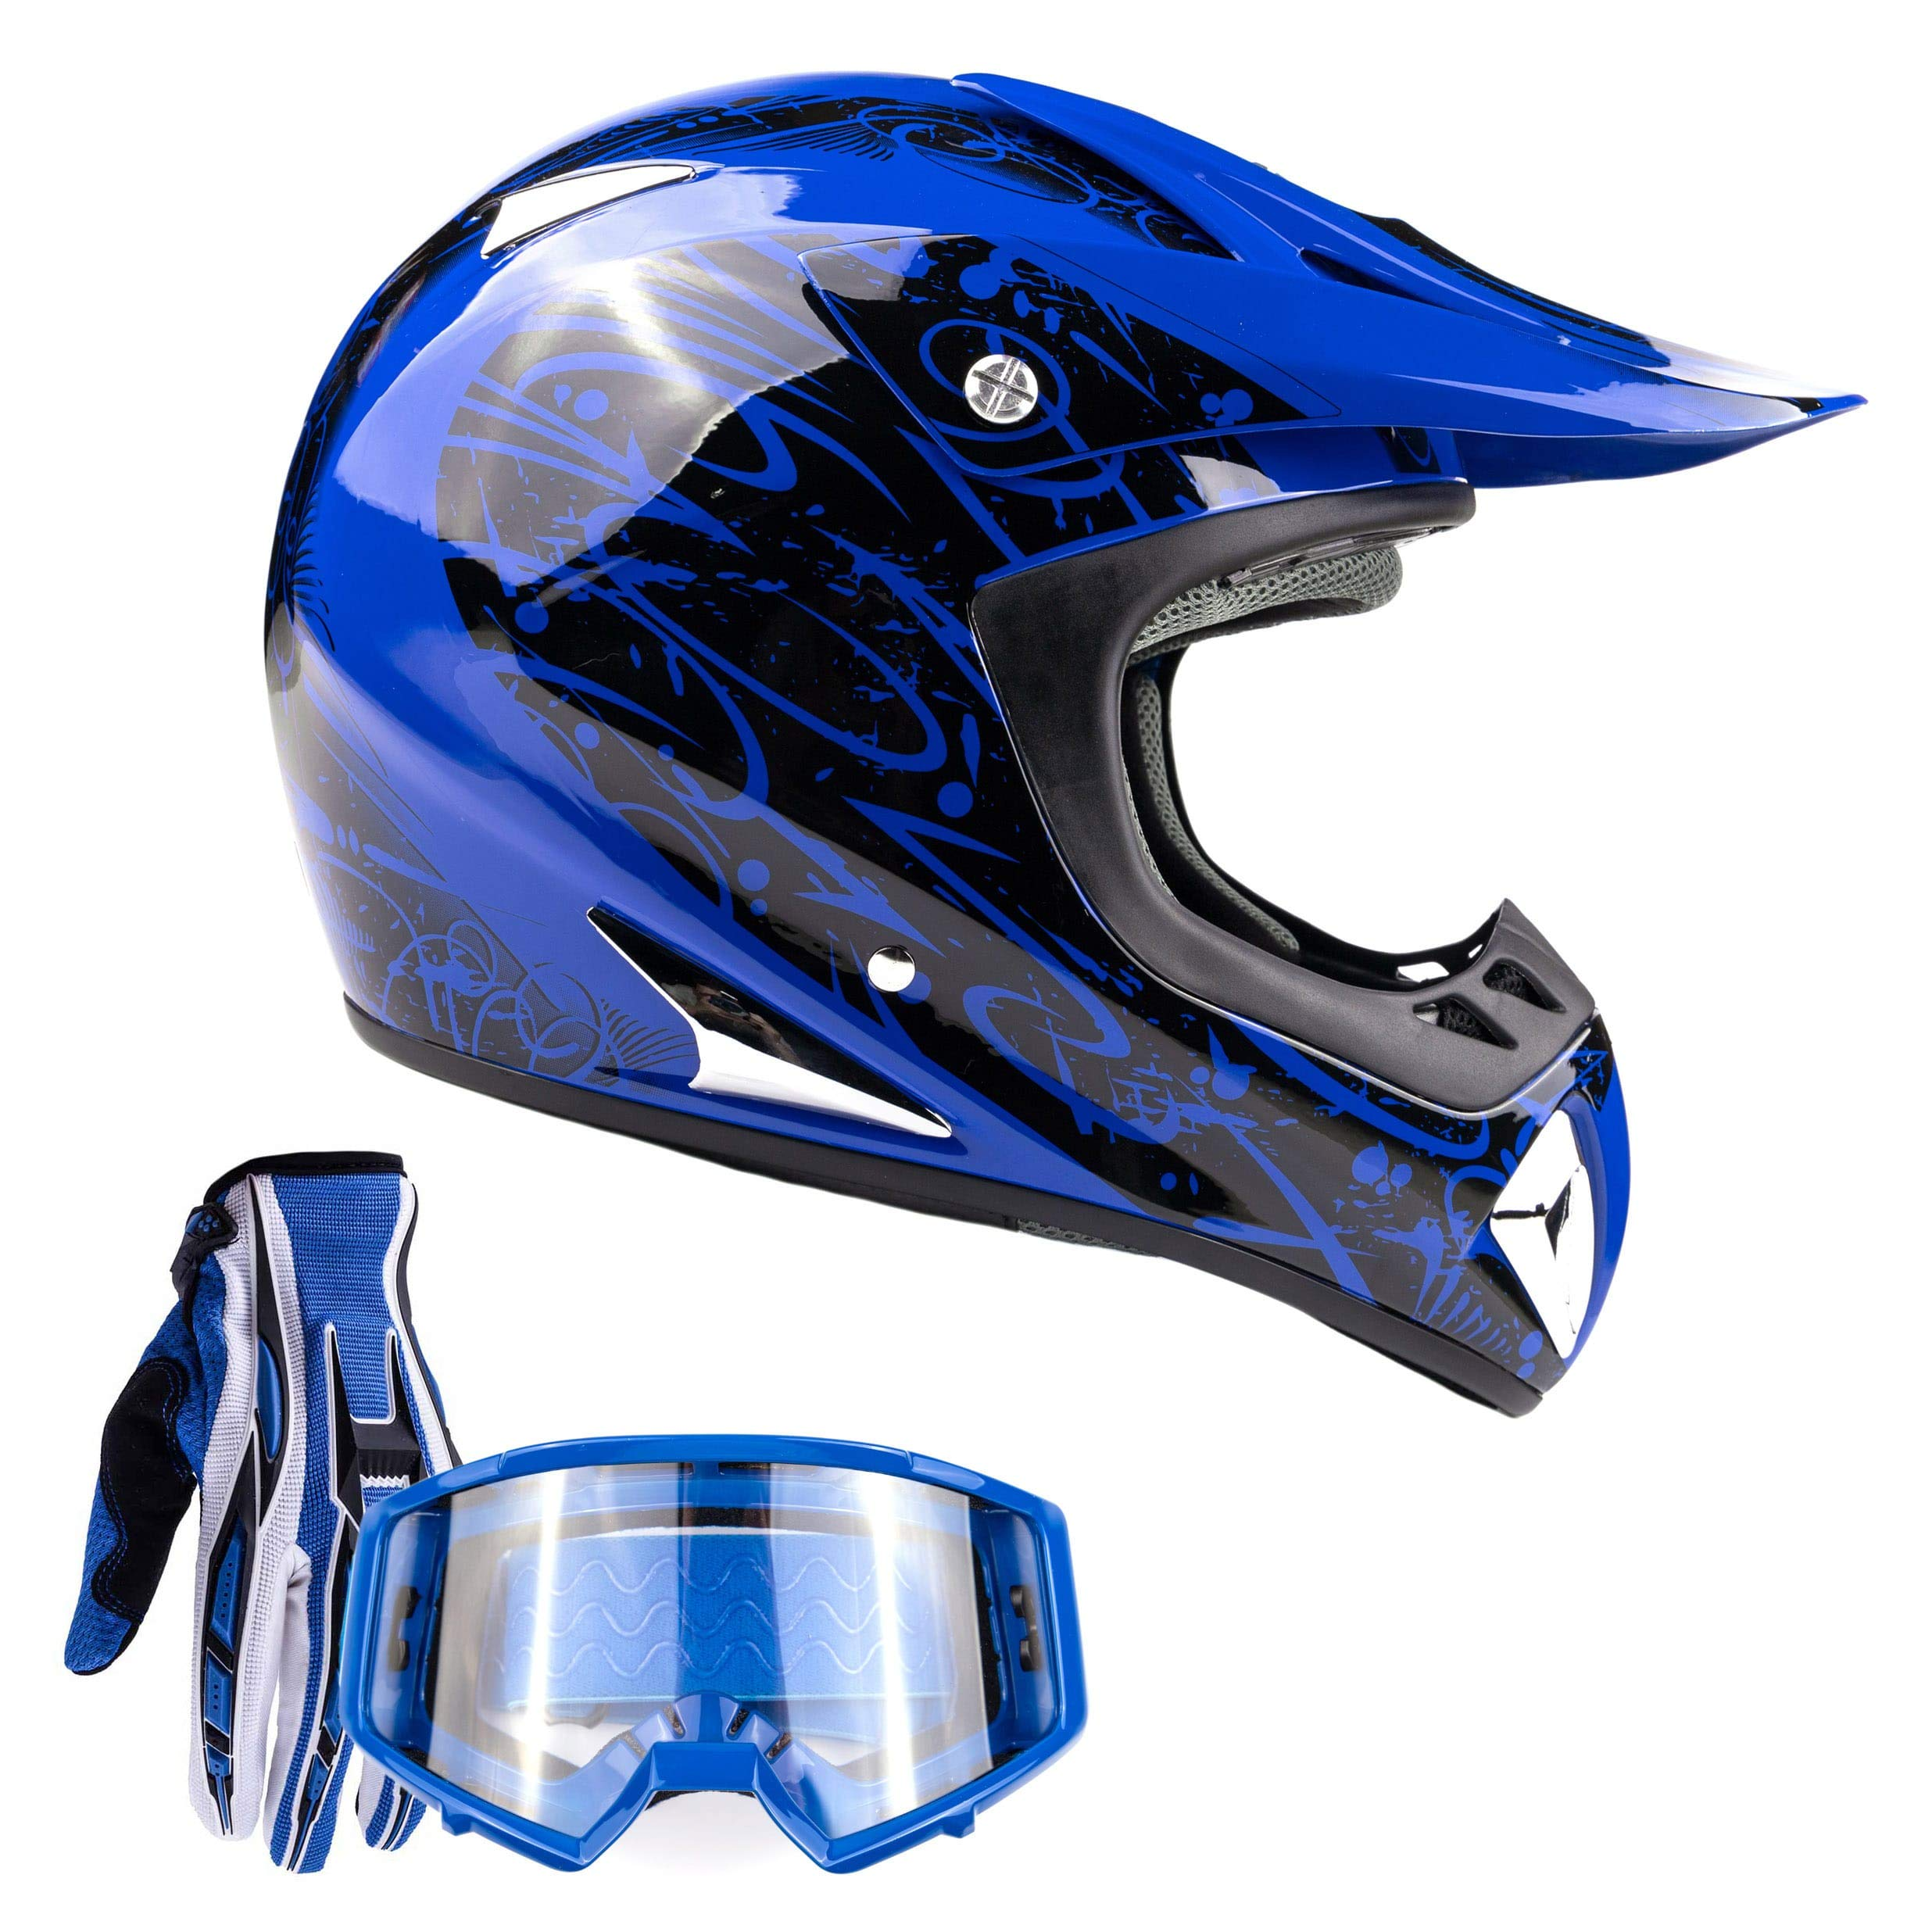 Typhoon Adult ATV MX Helmet Goggles Gloves Gear Combo Black Blue